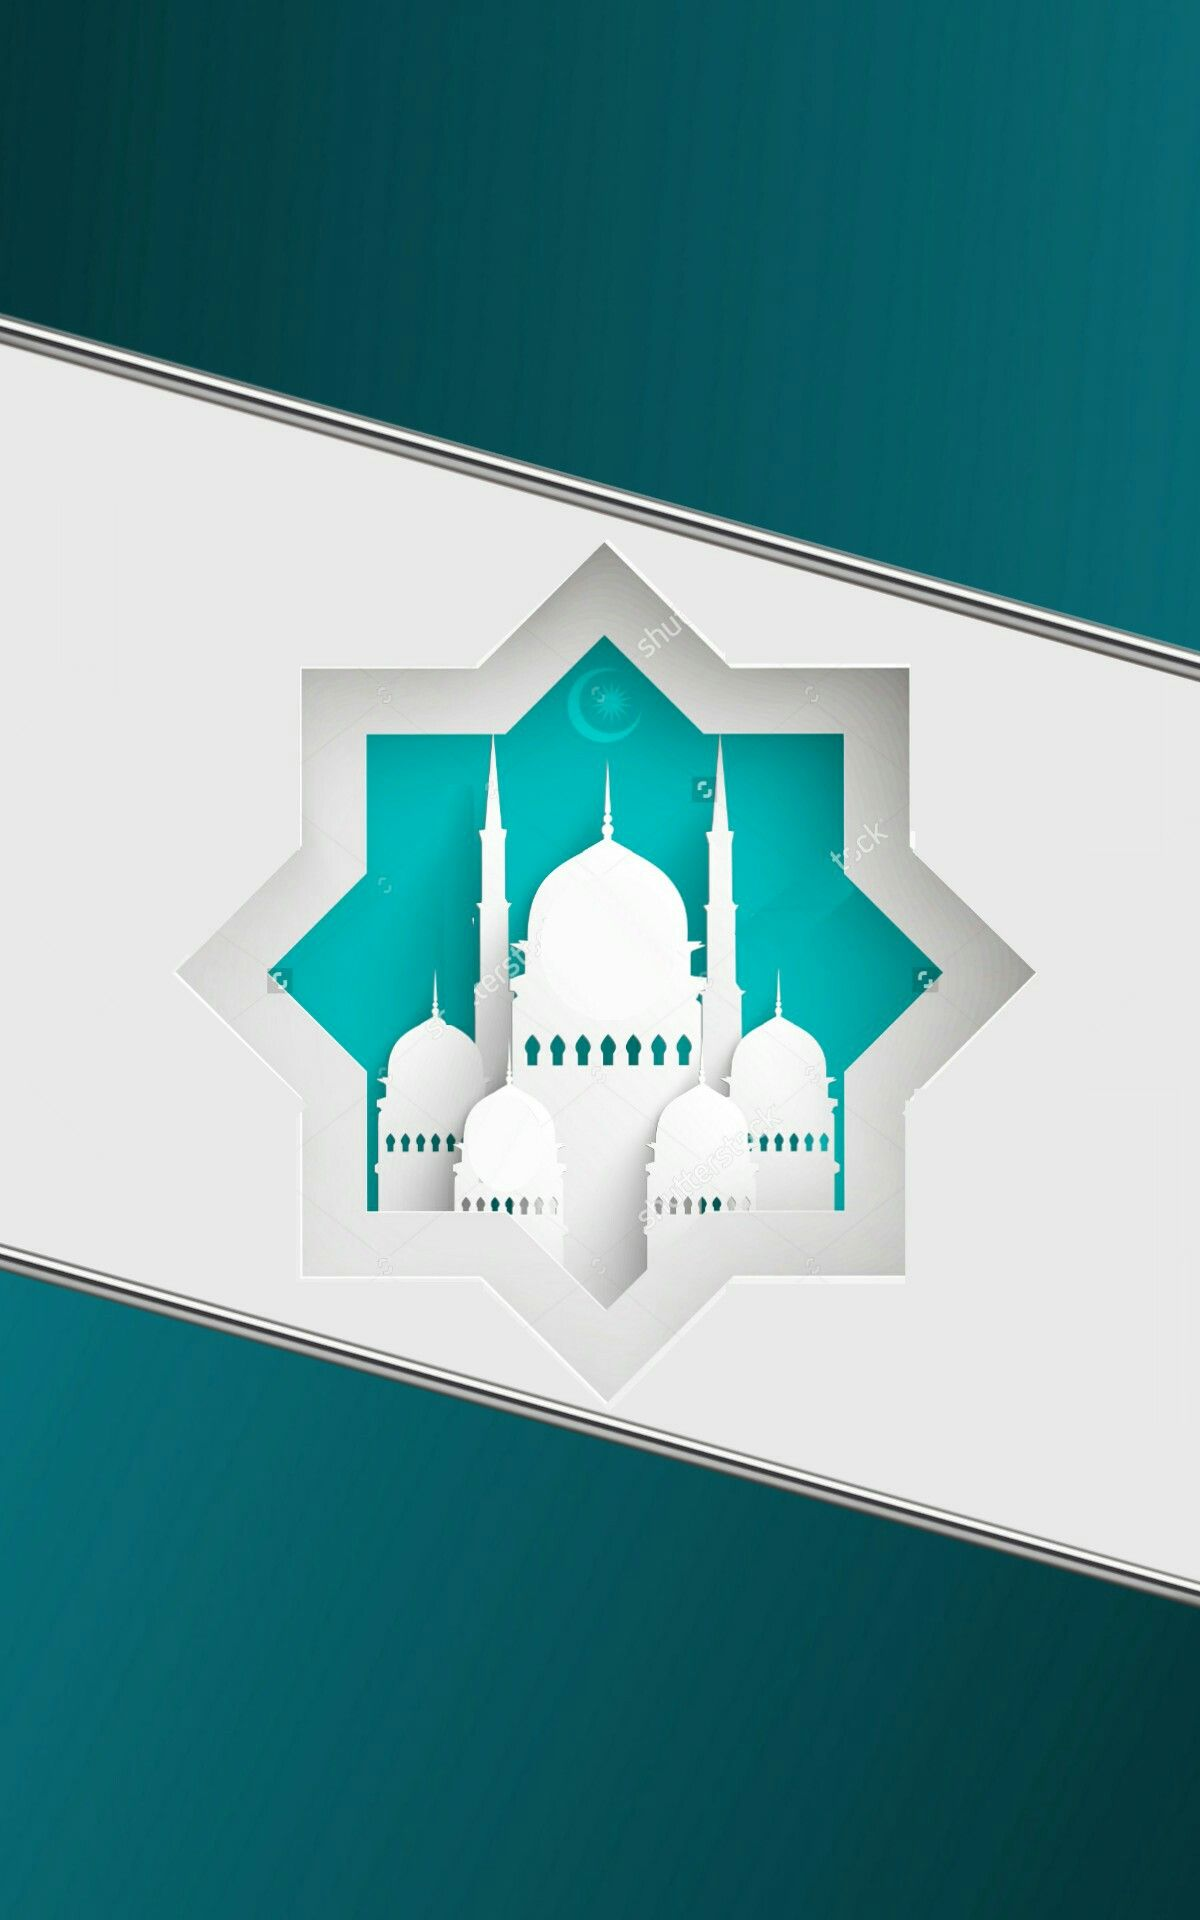 Wallpaper Hhqaaq22 Seni Islamis Latar Belakang Spanduk